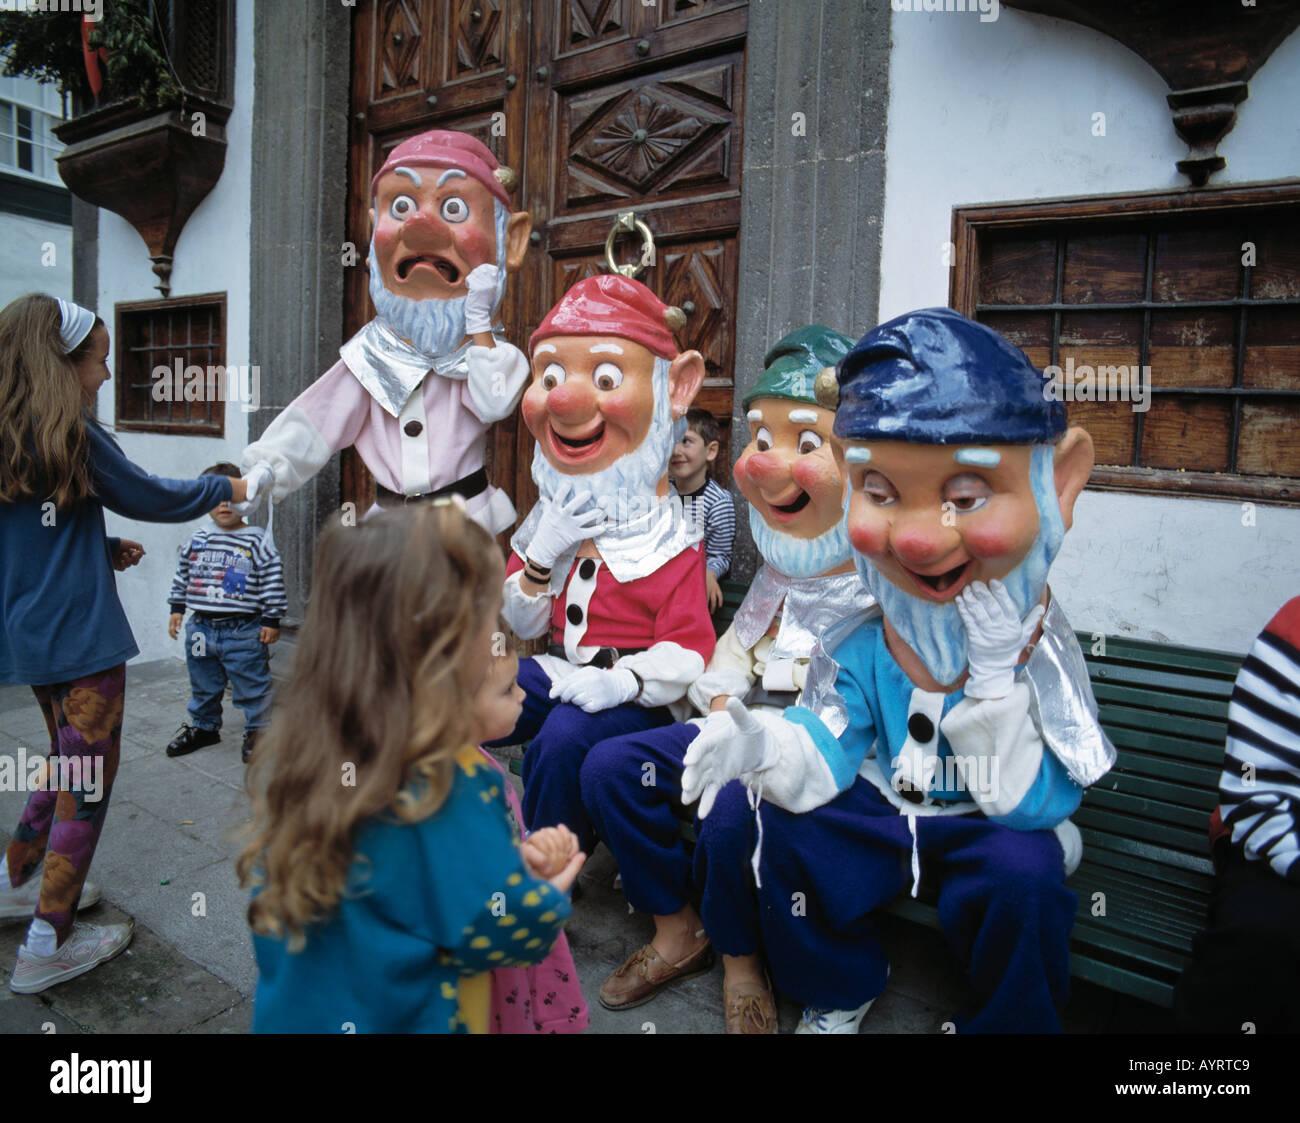 Spain, La Palma, Canary Islands, E-Santa Cruz de la Palma, Plaza de Espana, people, Christmas custom - Stock Image